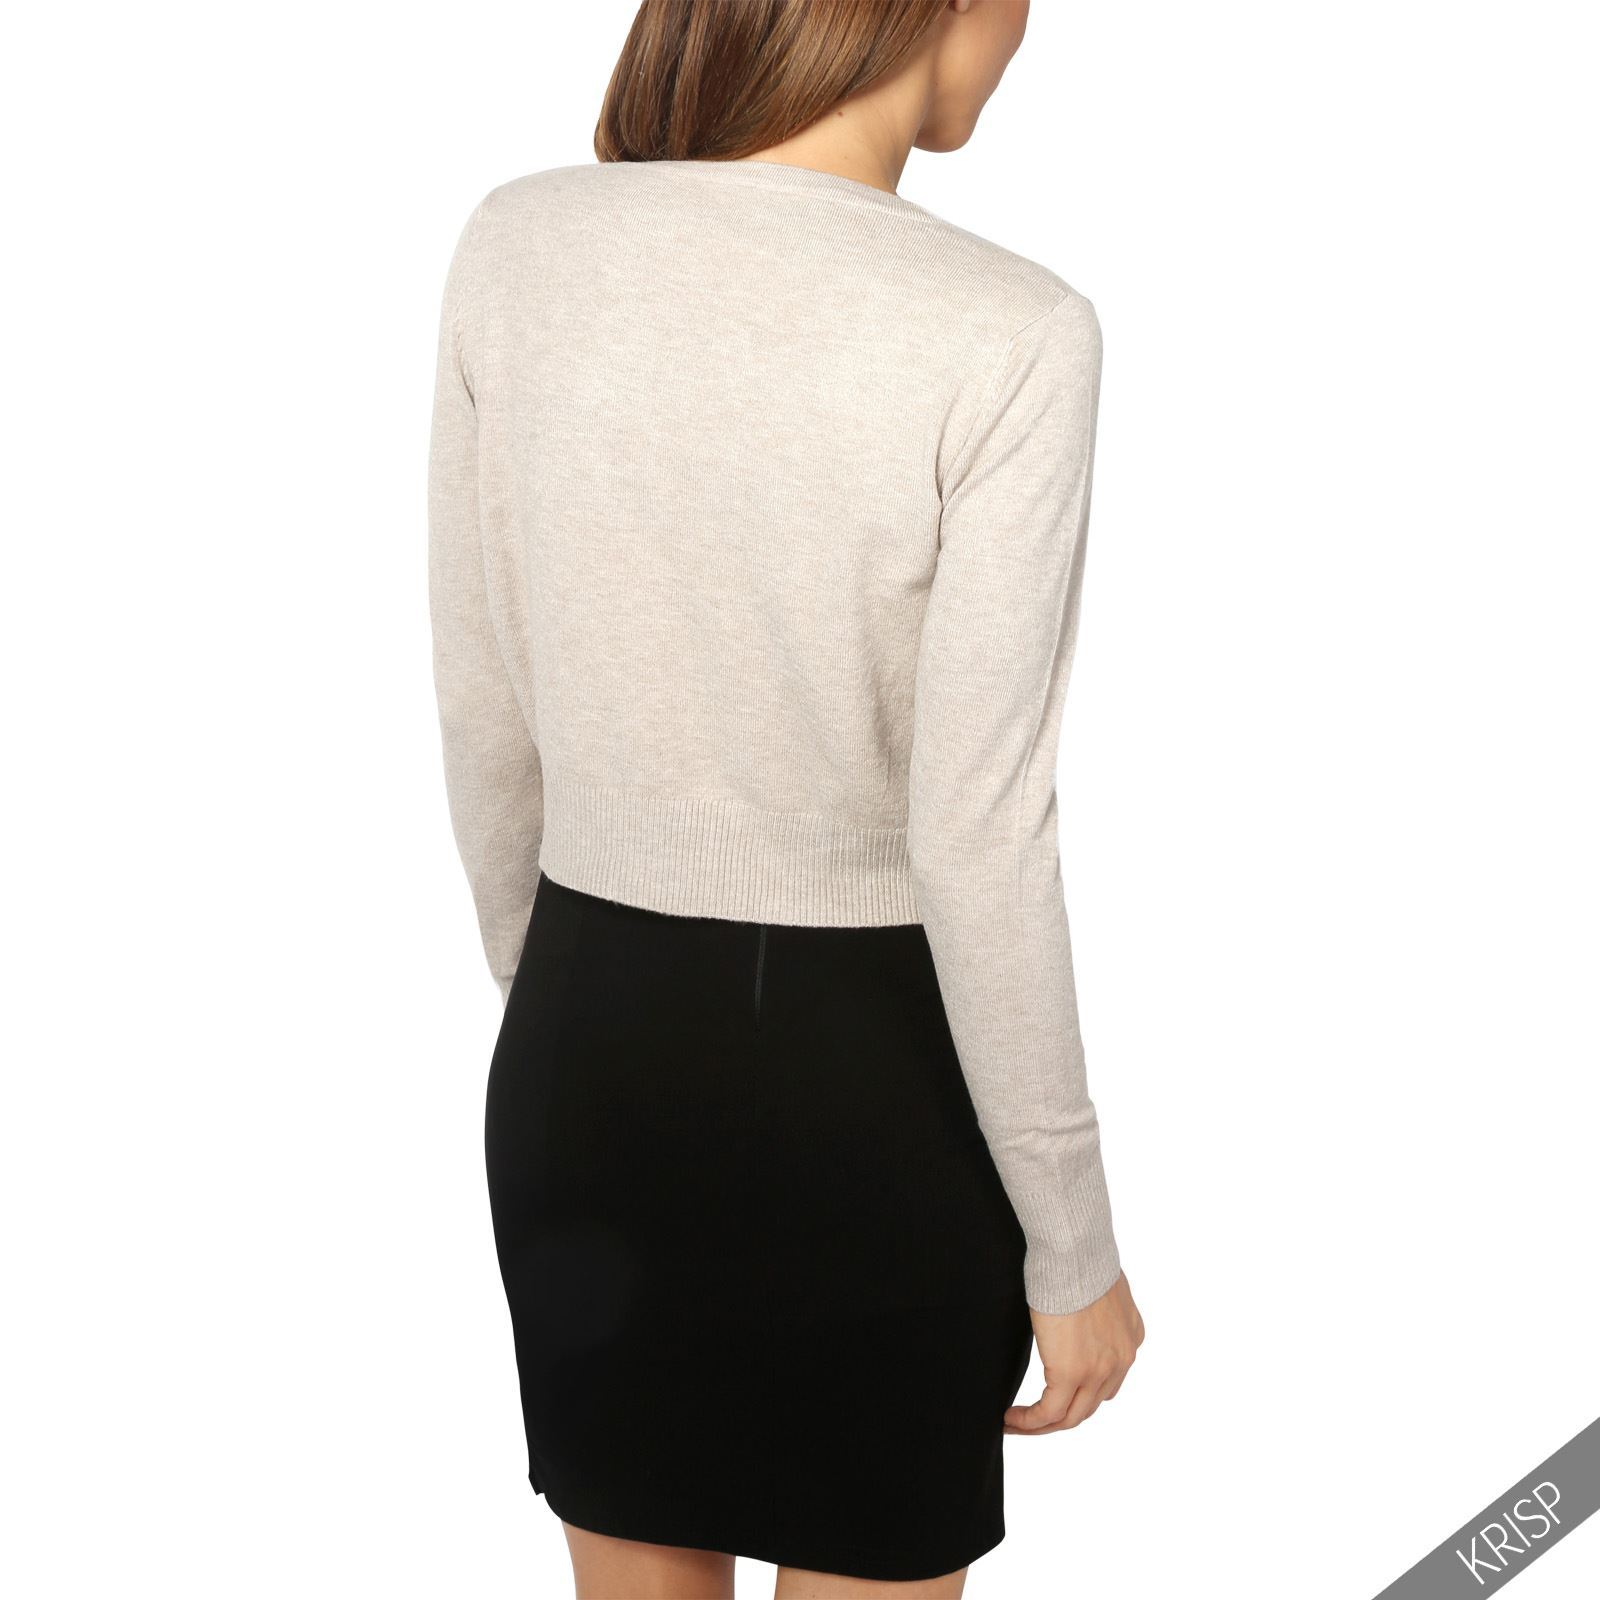 Womens-Ladies-Bolero-Shrug-Silky-Soft-Cardigan-Long-Sleeve-Knit-Short-Top-Work thumbnail 33